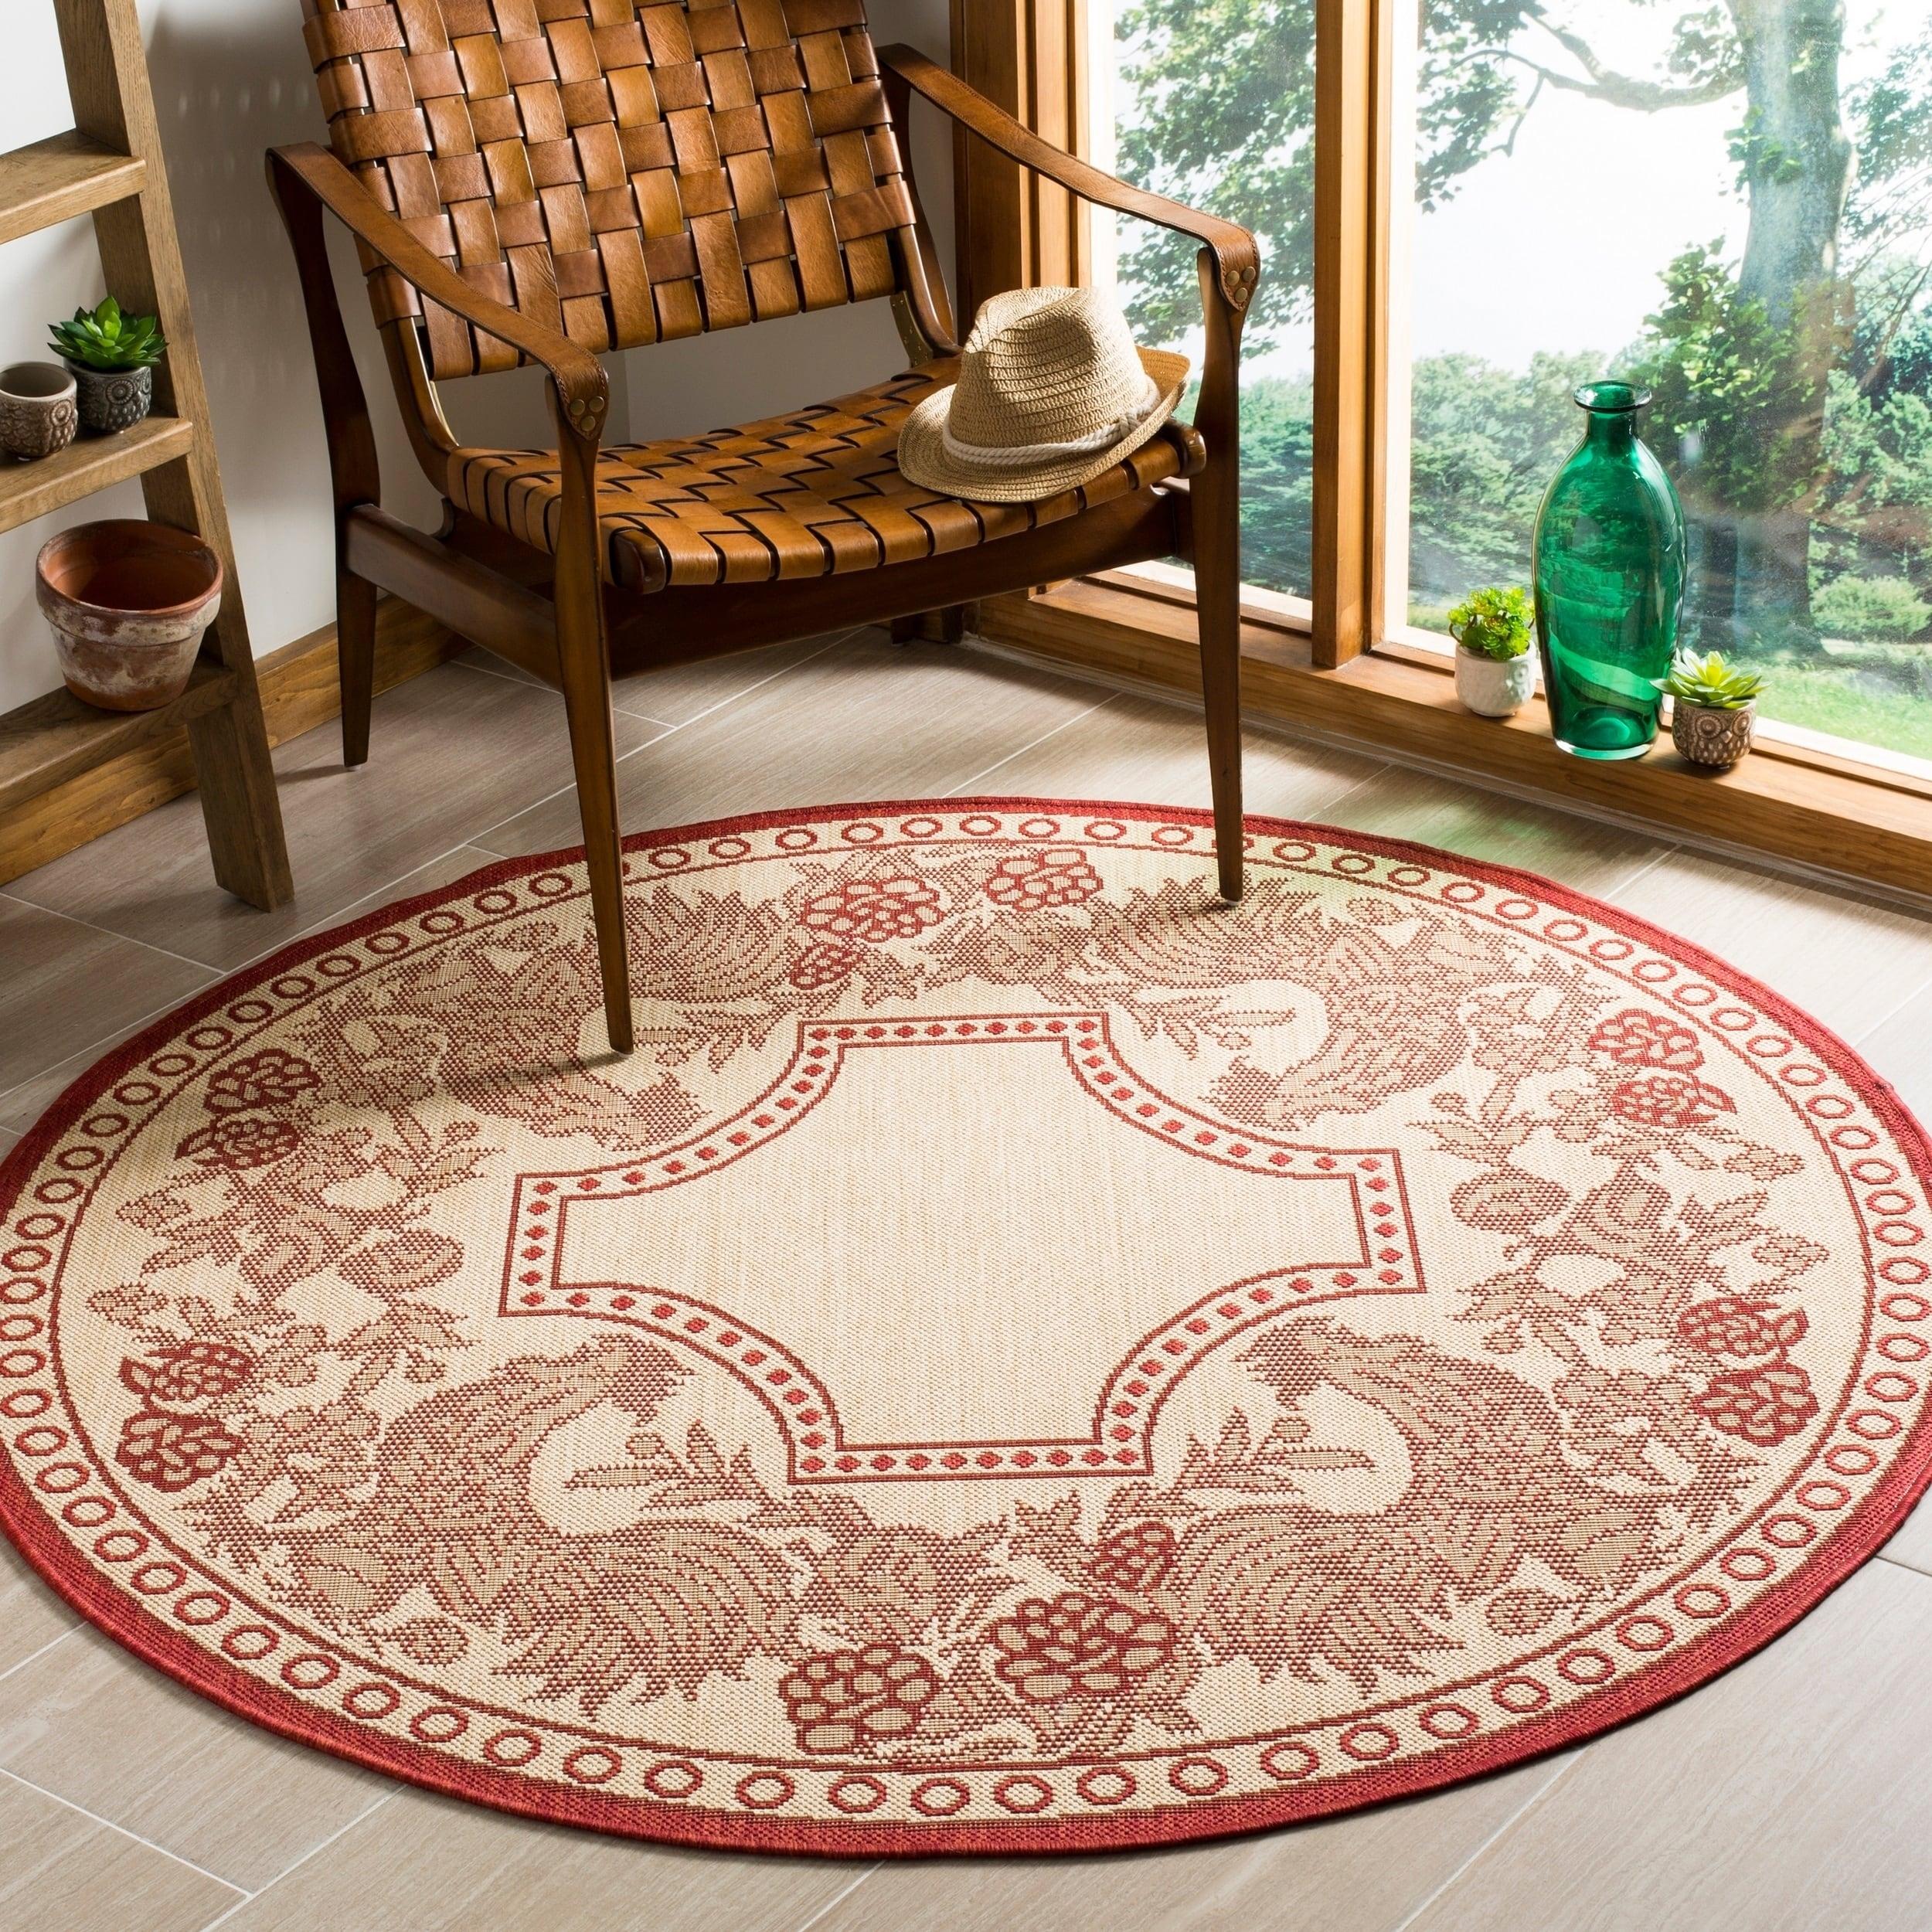 Safavieh Rooster Natural/ Red Indoor/ Outdoor Rug (6'7